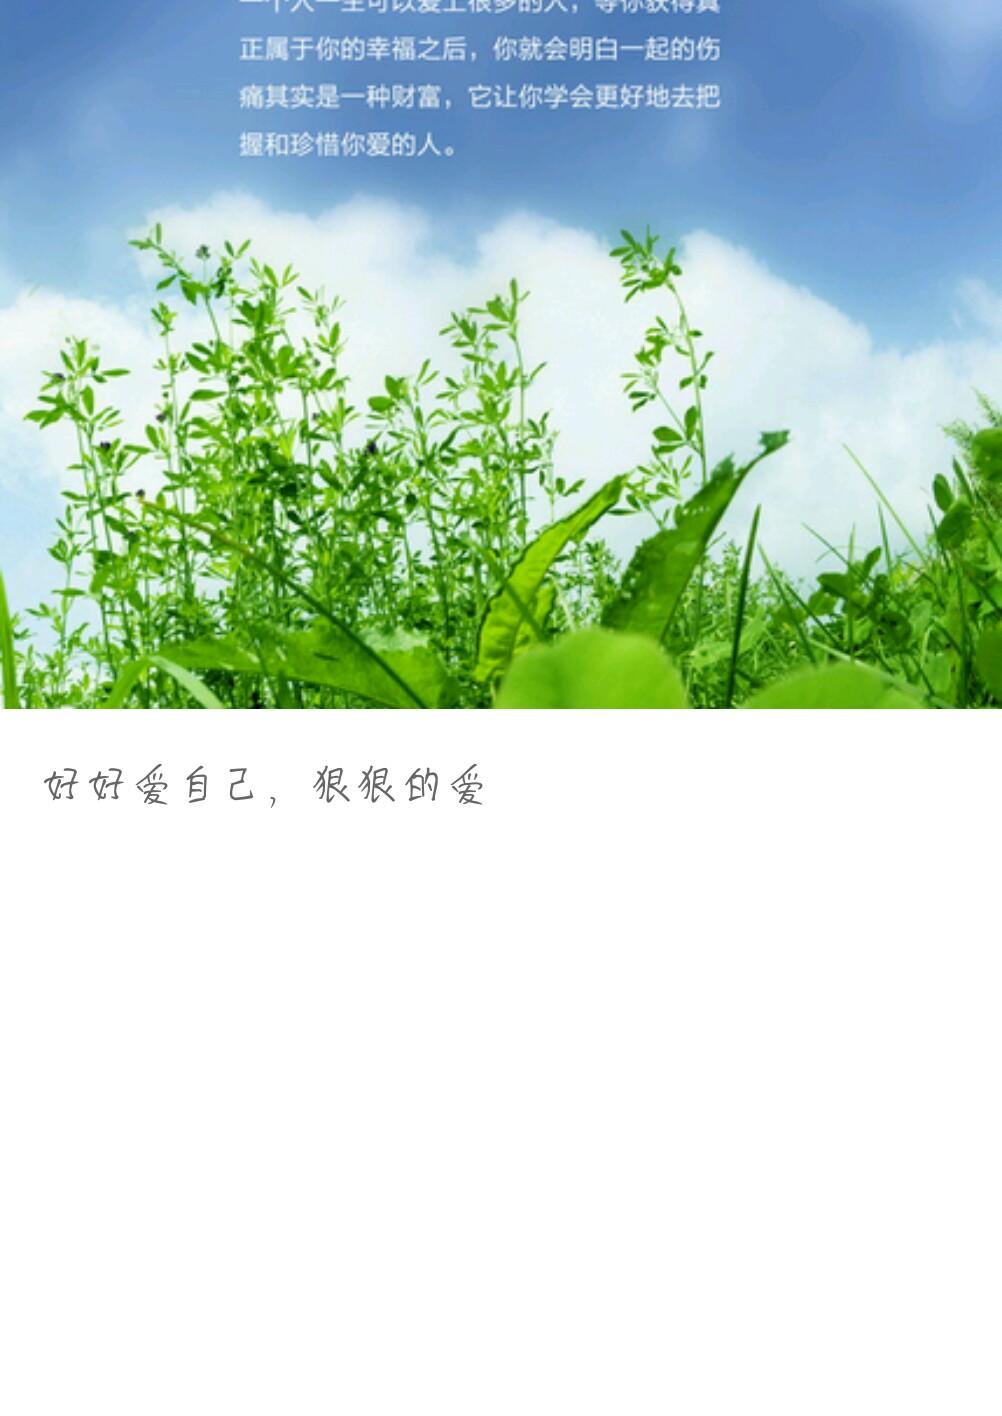 http://www.58100.com/pid/606558.html